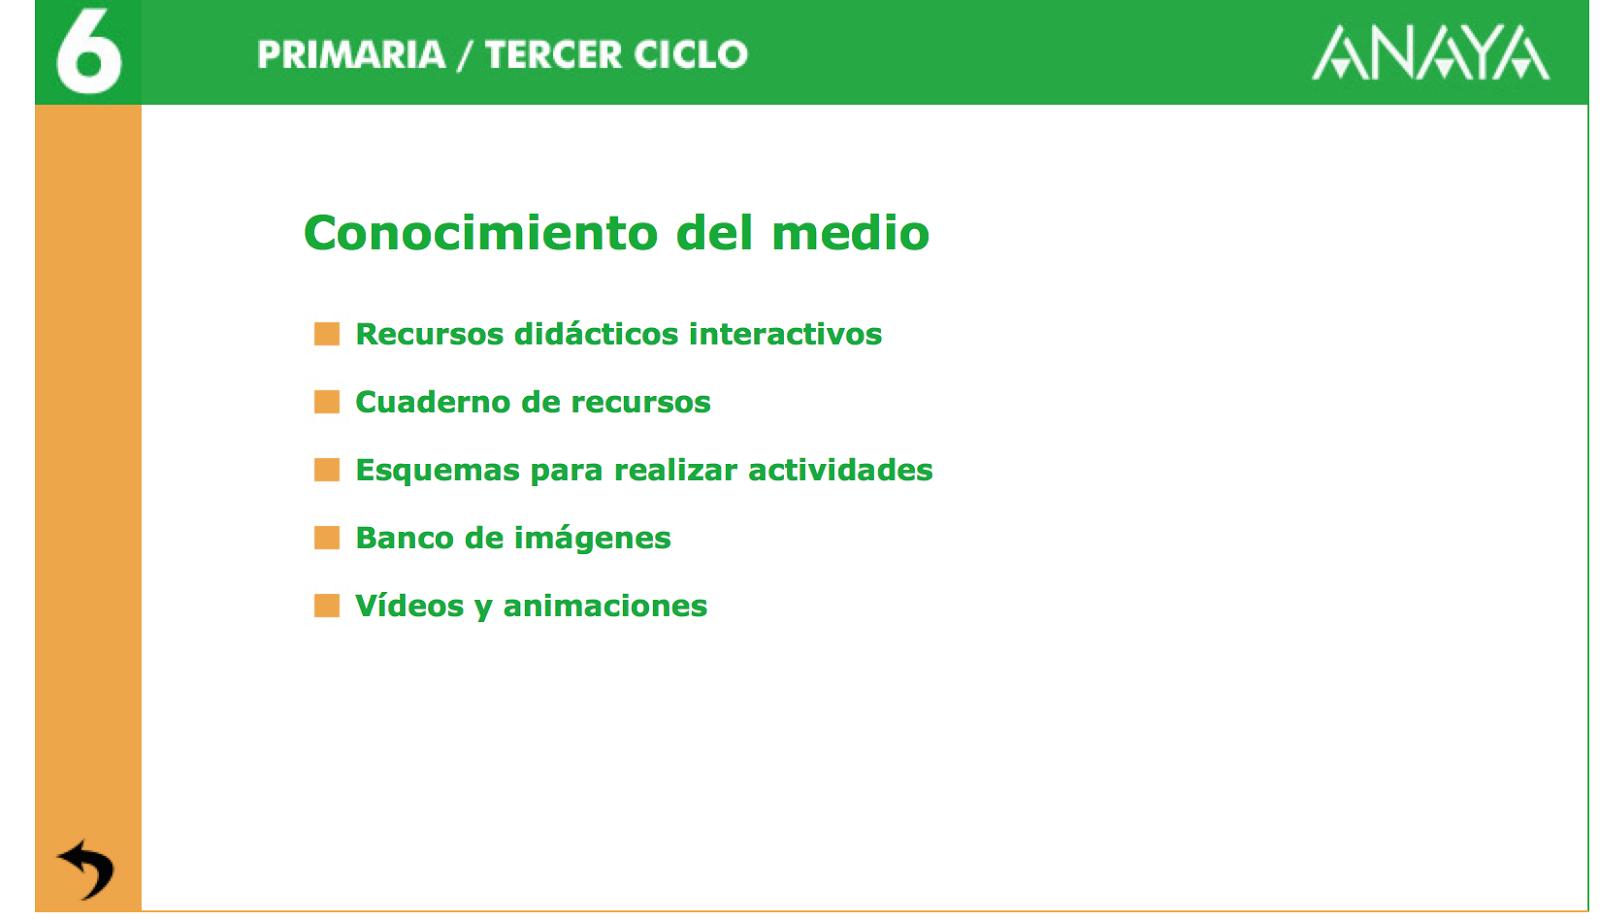 http://ceipgrancapitan.es/anaya/anaya_cono_6/Programa/menu_and.htm